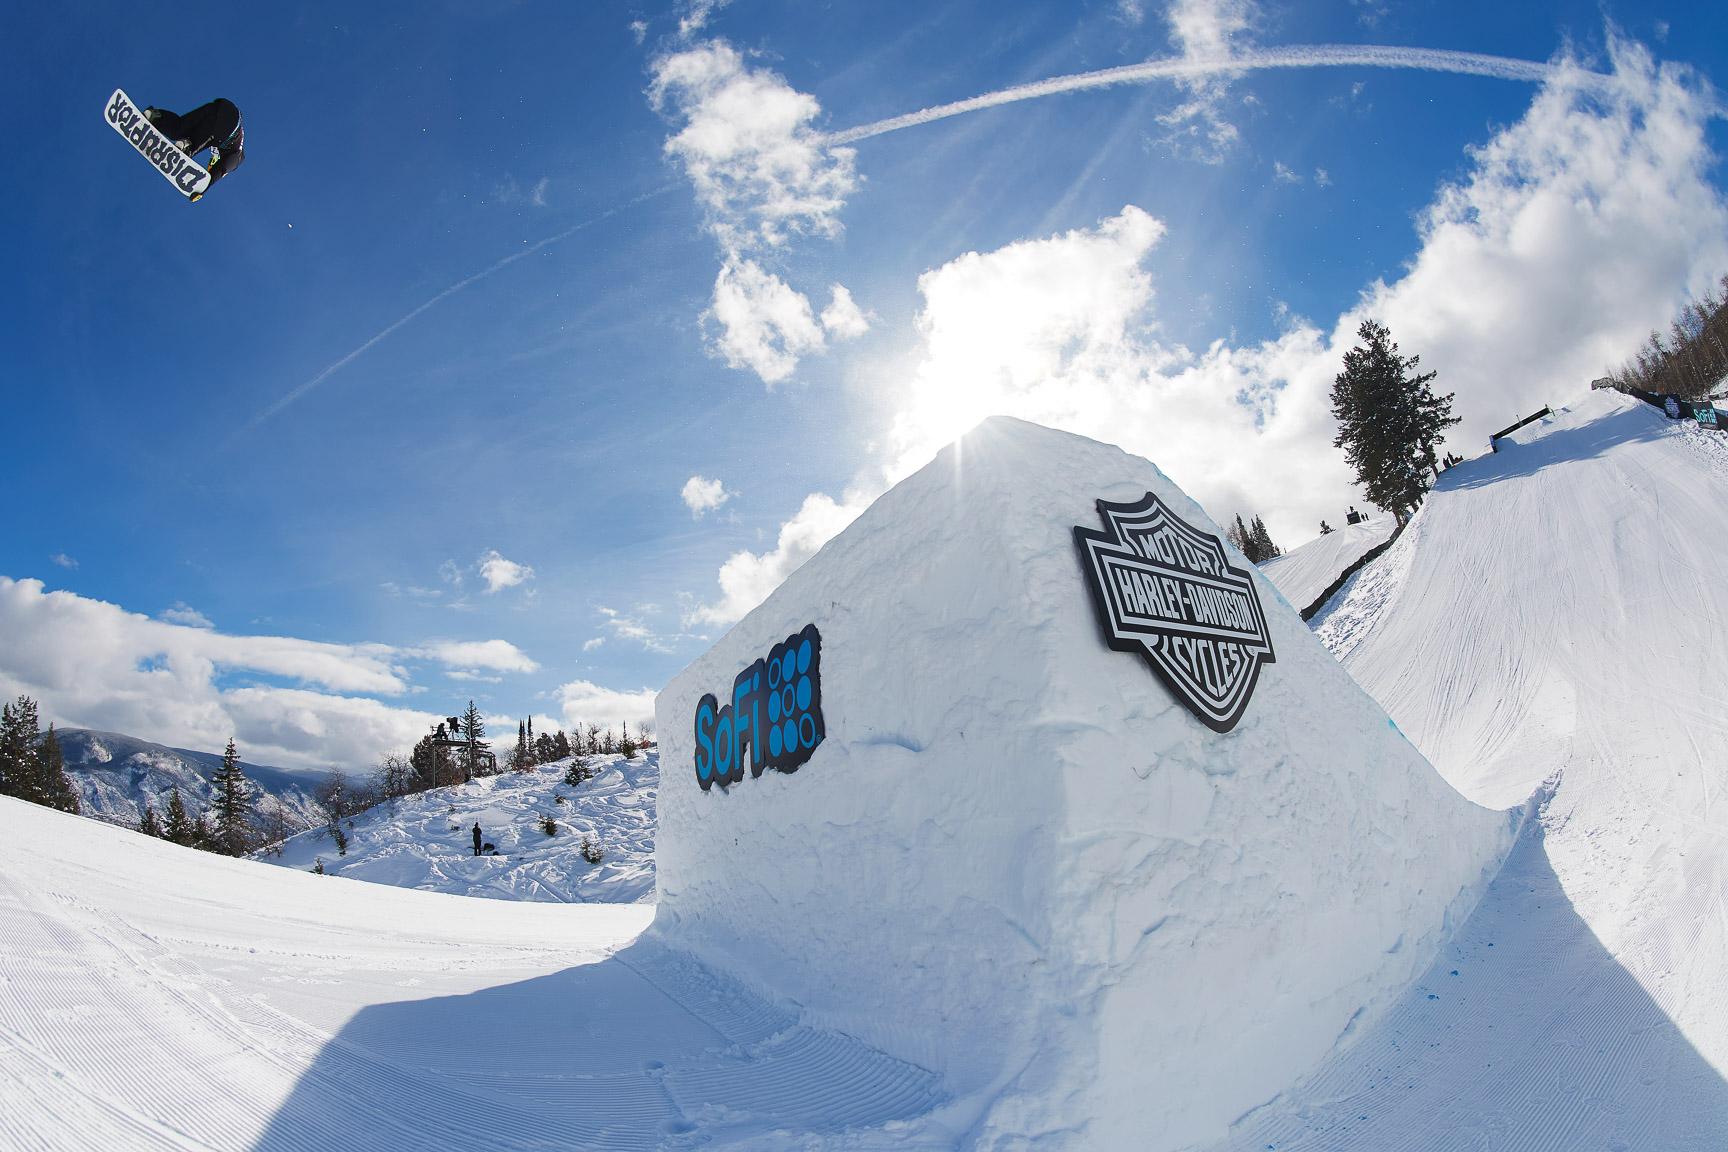 Kyle Mack, Men's Snowboard Slopestyle Elim